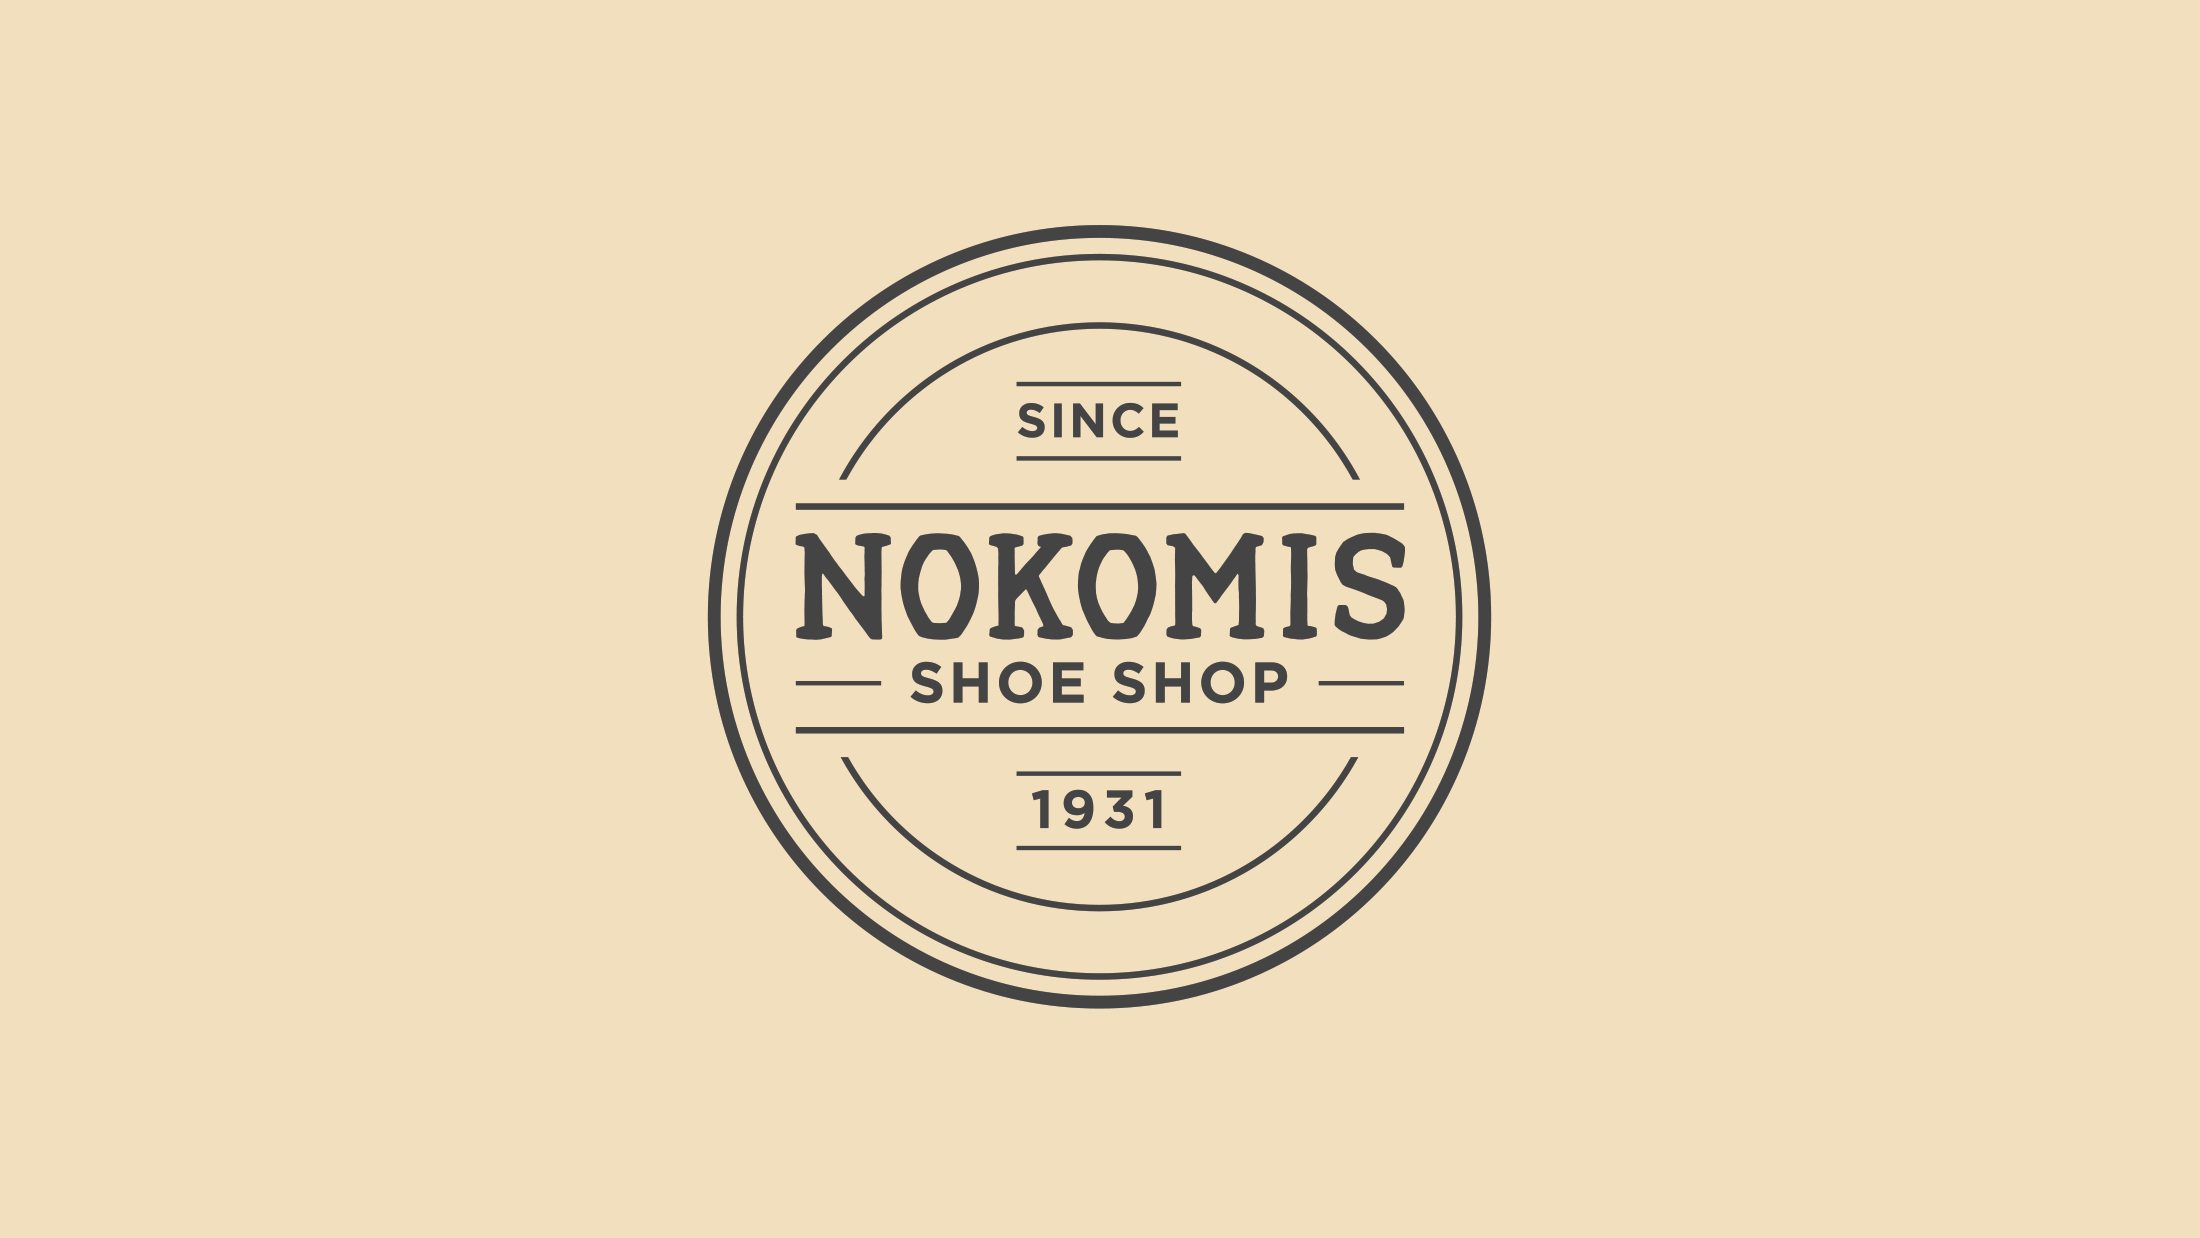 Nokomis Shoe Shop Inc